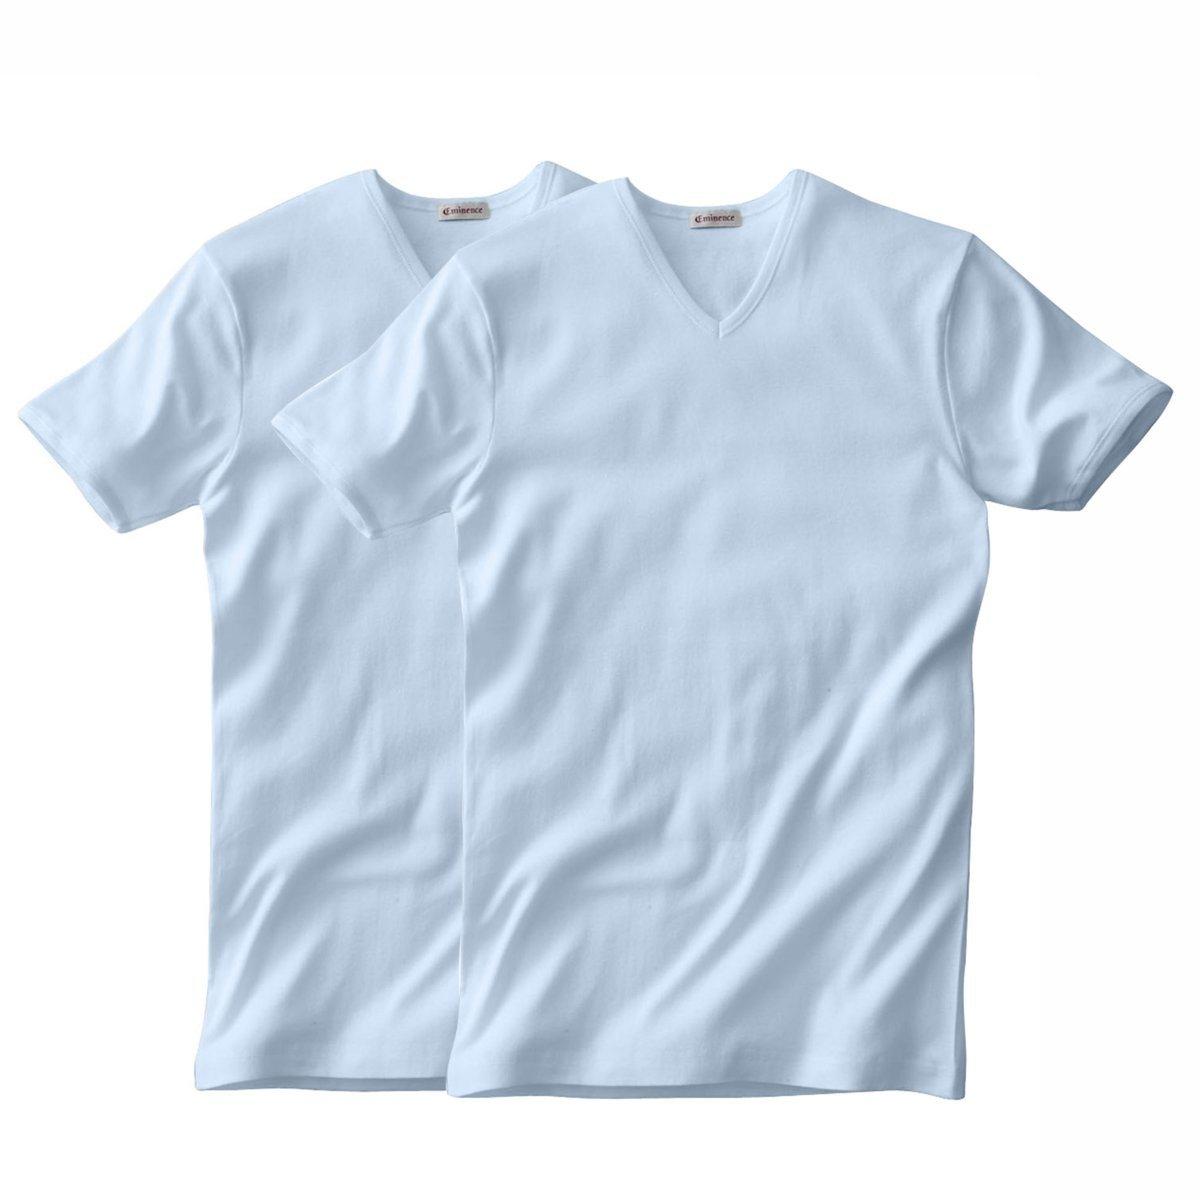 Комплект из 2 футболок EMINENCE с V-образным вырезом и короткими рукавами b screen b156xw02 v 2 v 0 v 3 v 6 fit b156xtn02 claa156wb11a n156b6 l04 n156b6 l0b bt156gw01 n156bge l21 lp156wh4 tla1 tlc1 b1